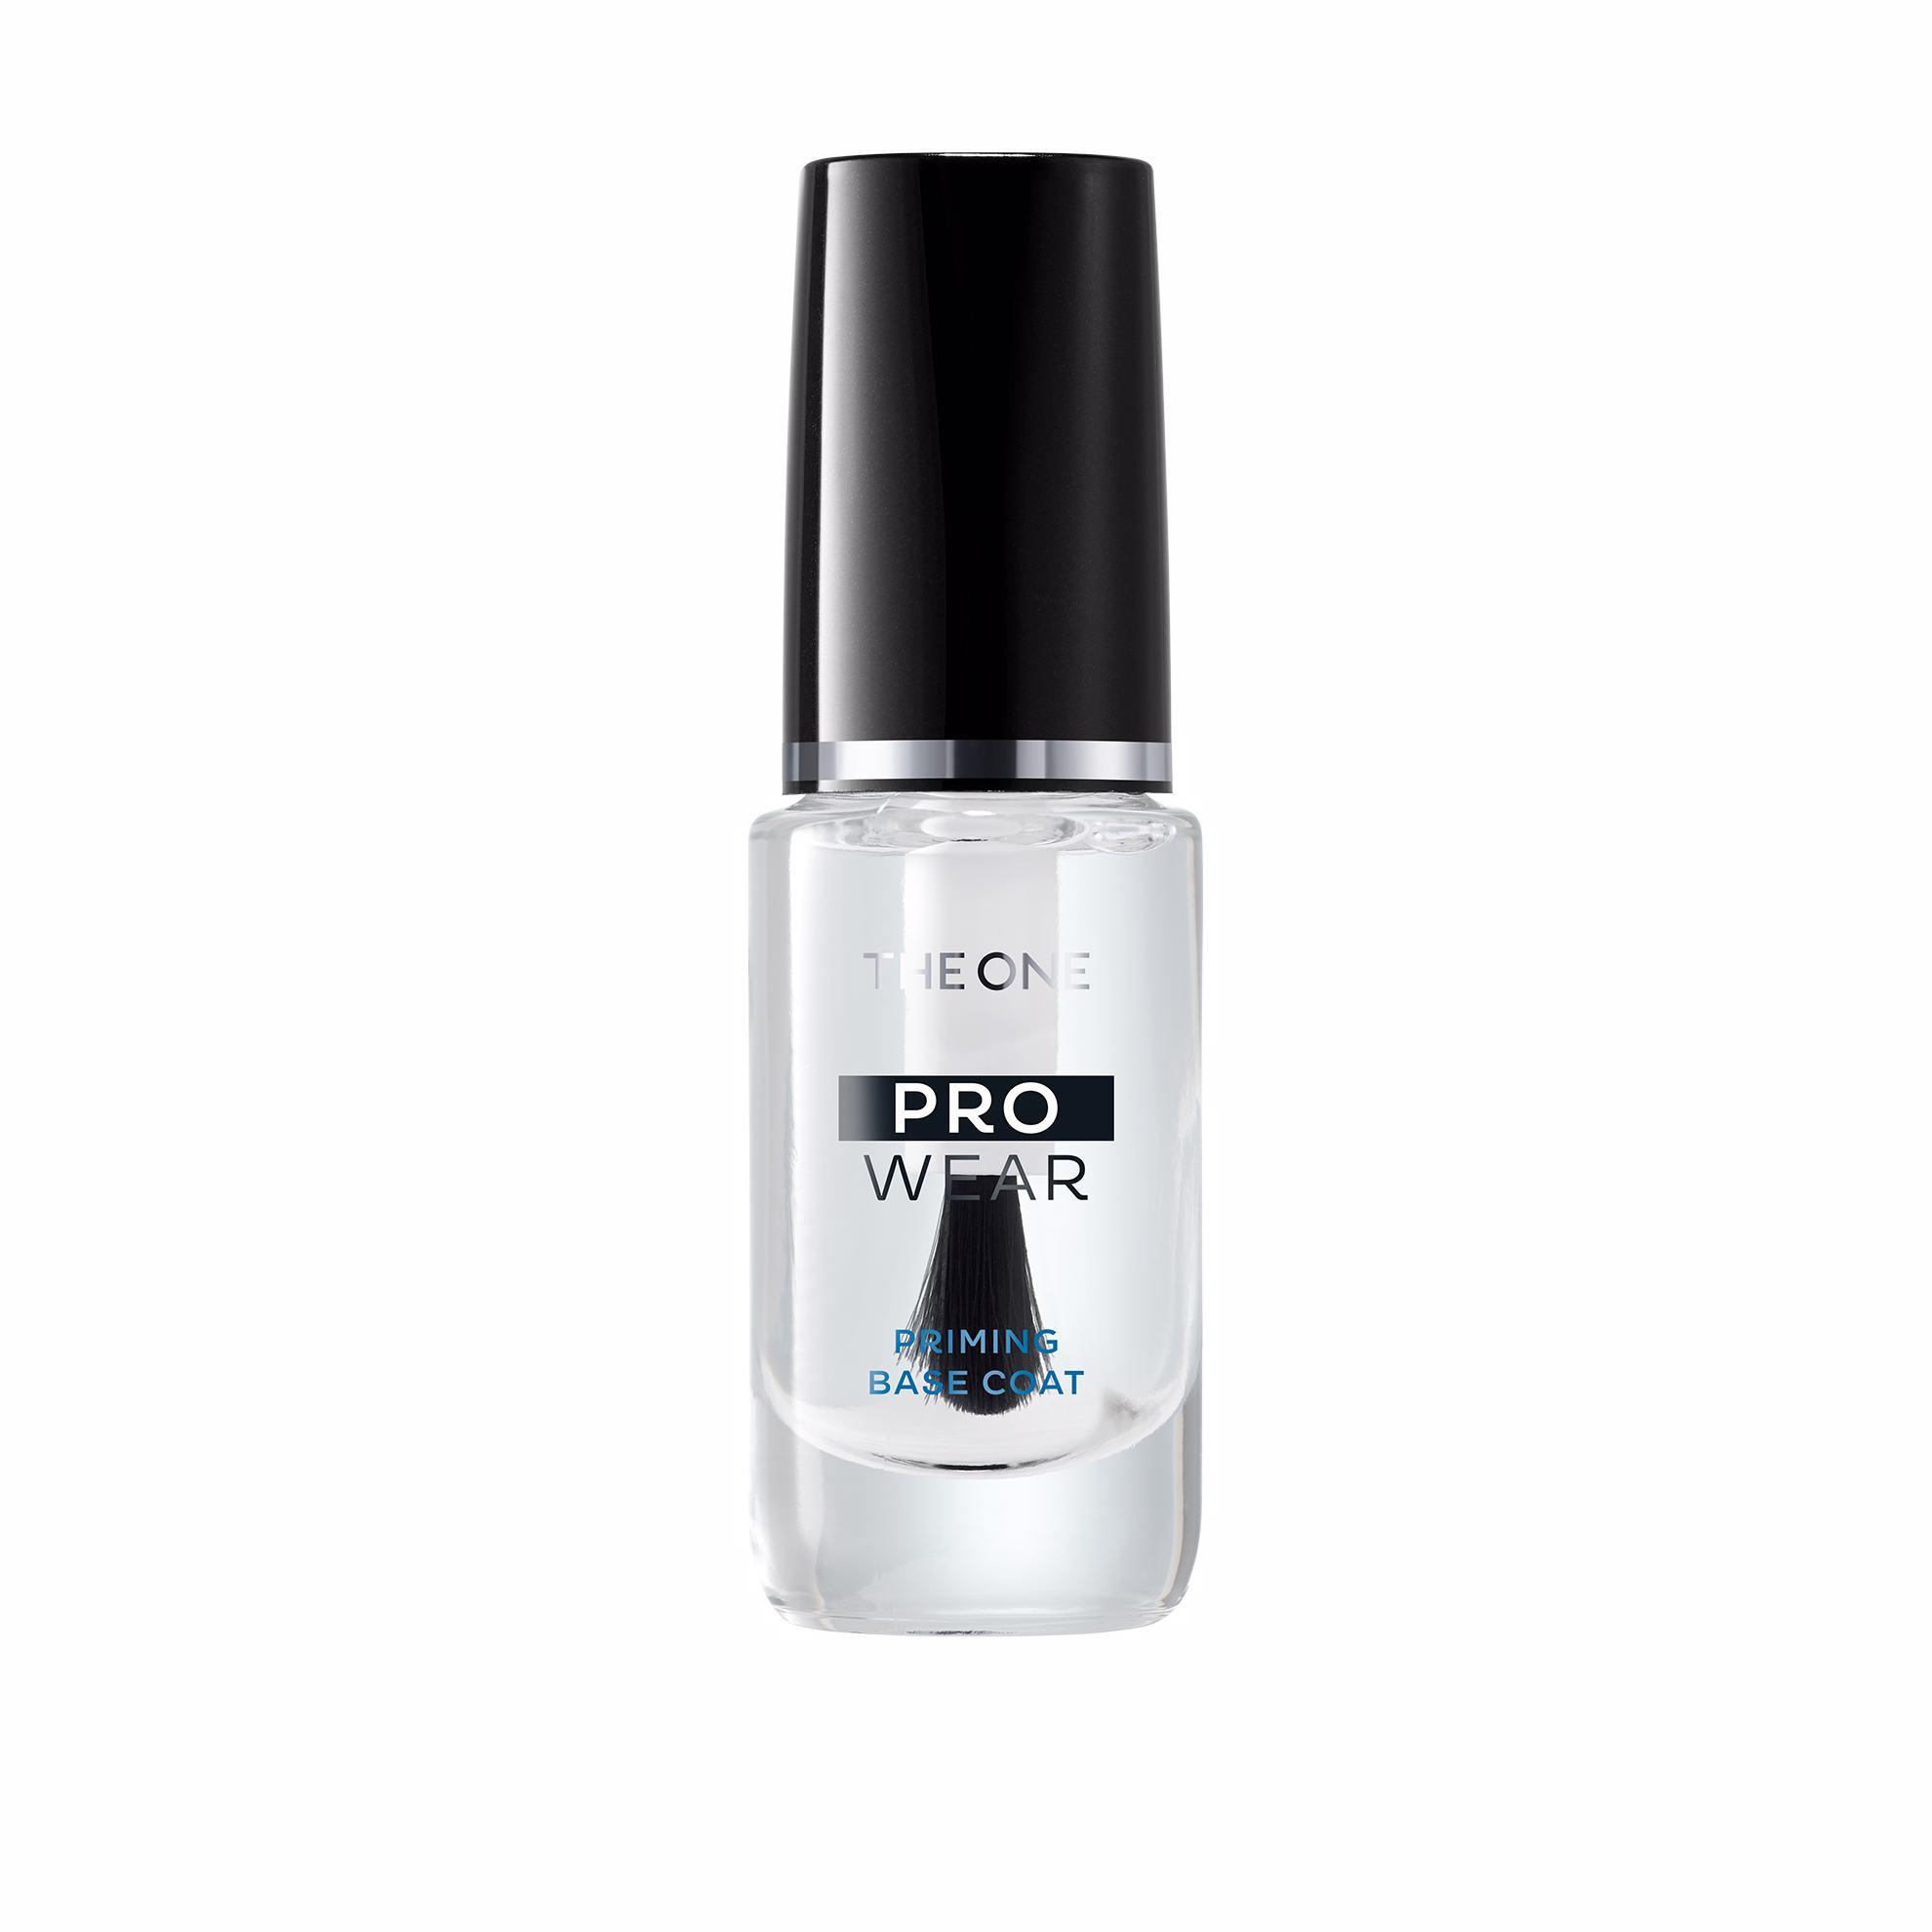 Podkladovy Lak Na Nechty The One Pro Wear 37907 Oriflame Cosmetics